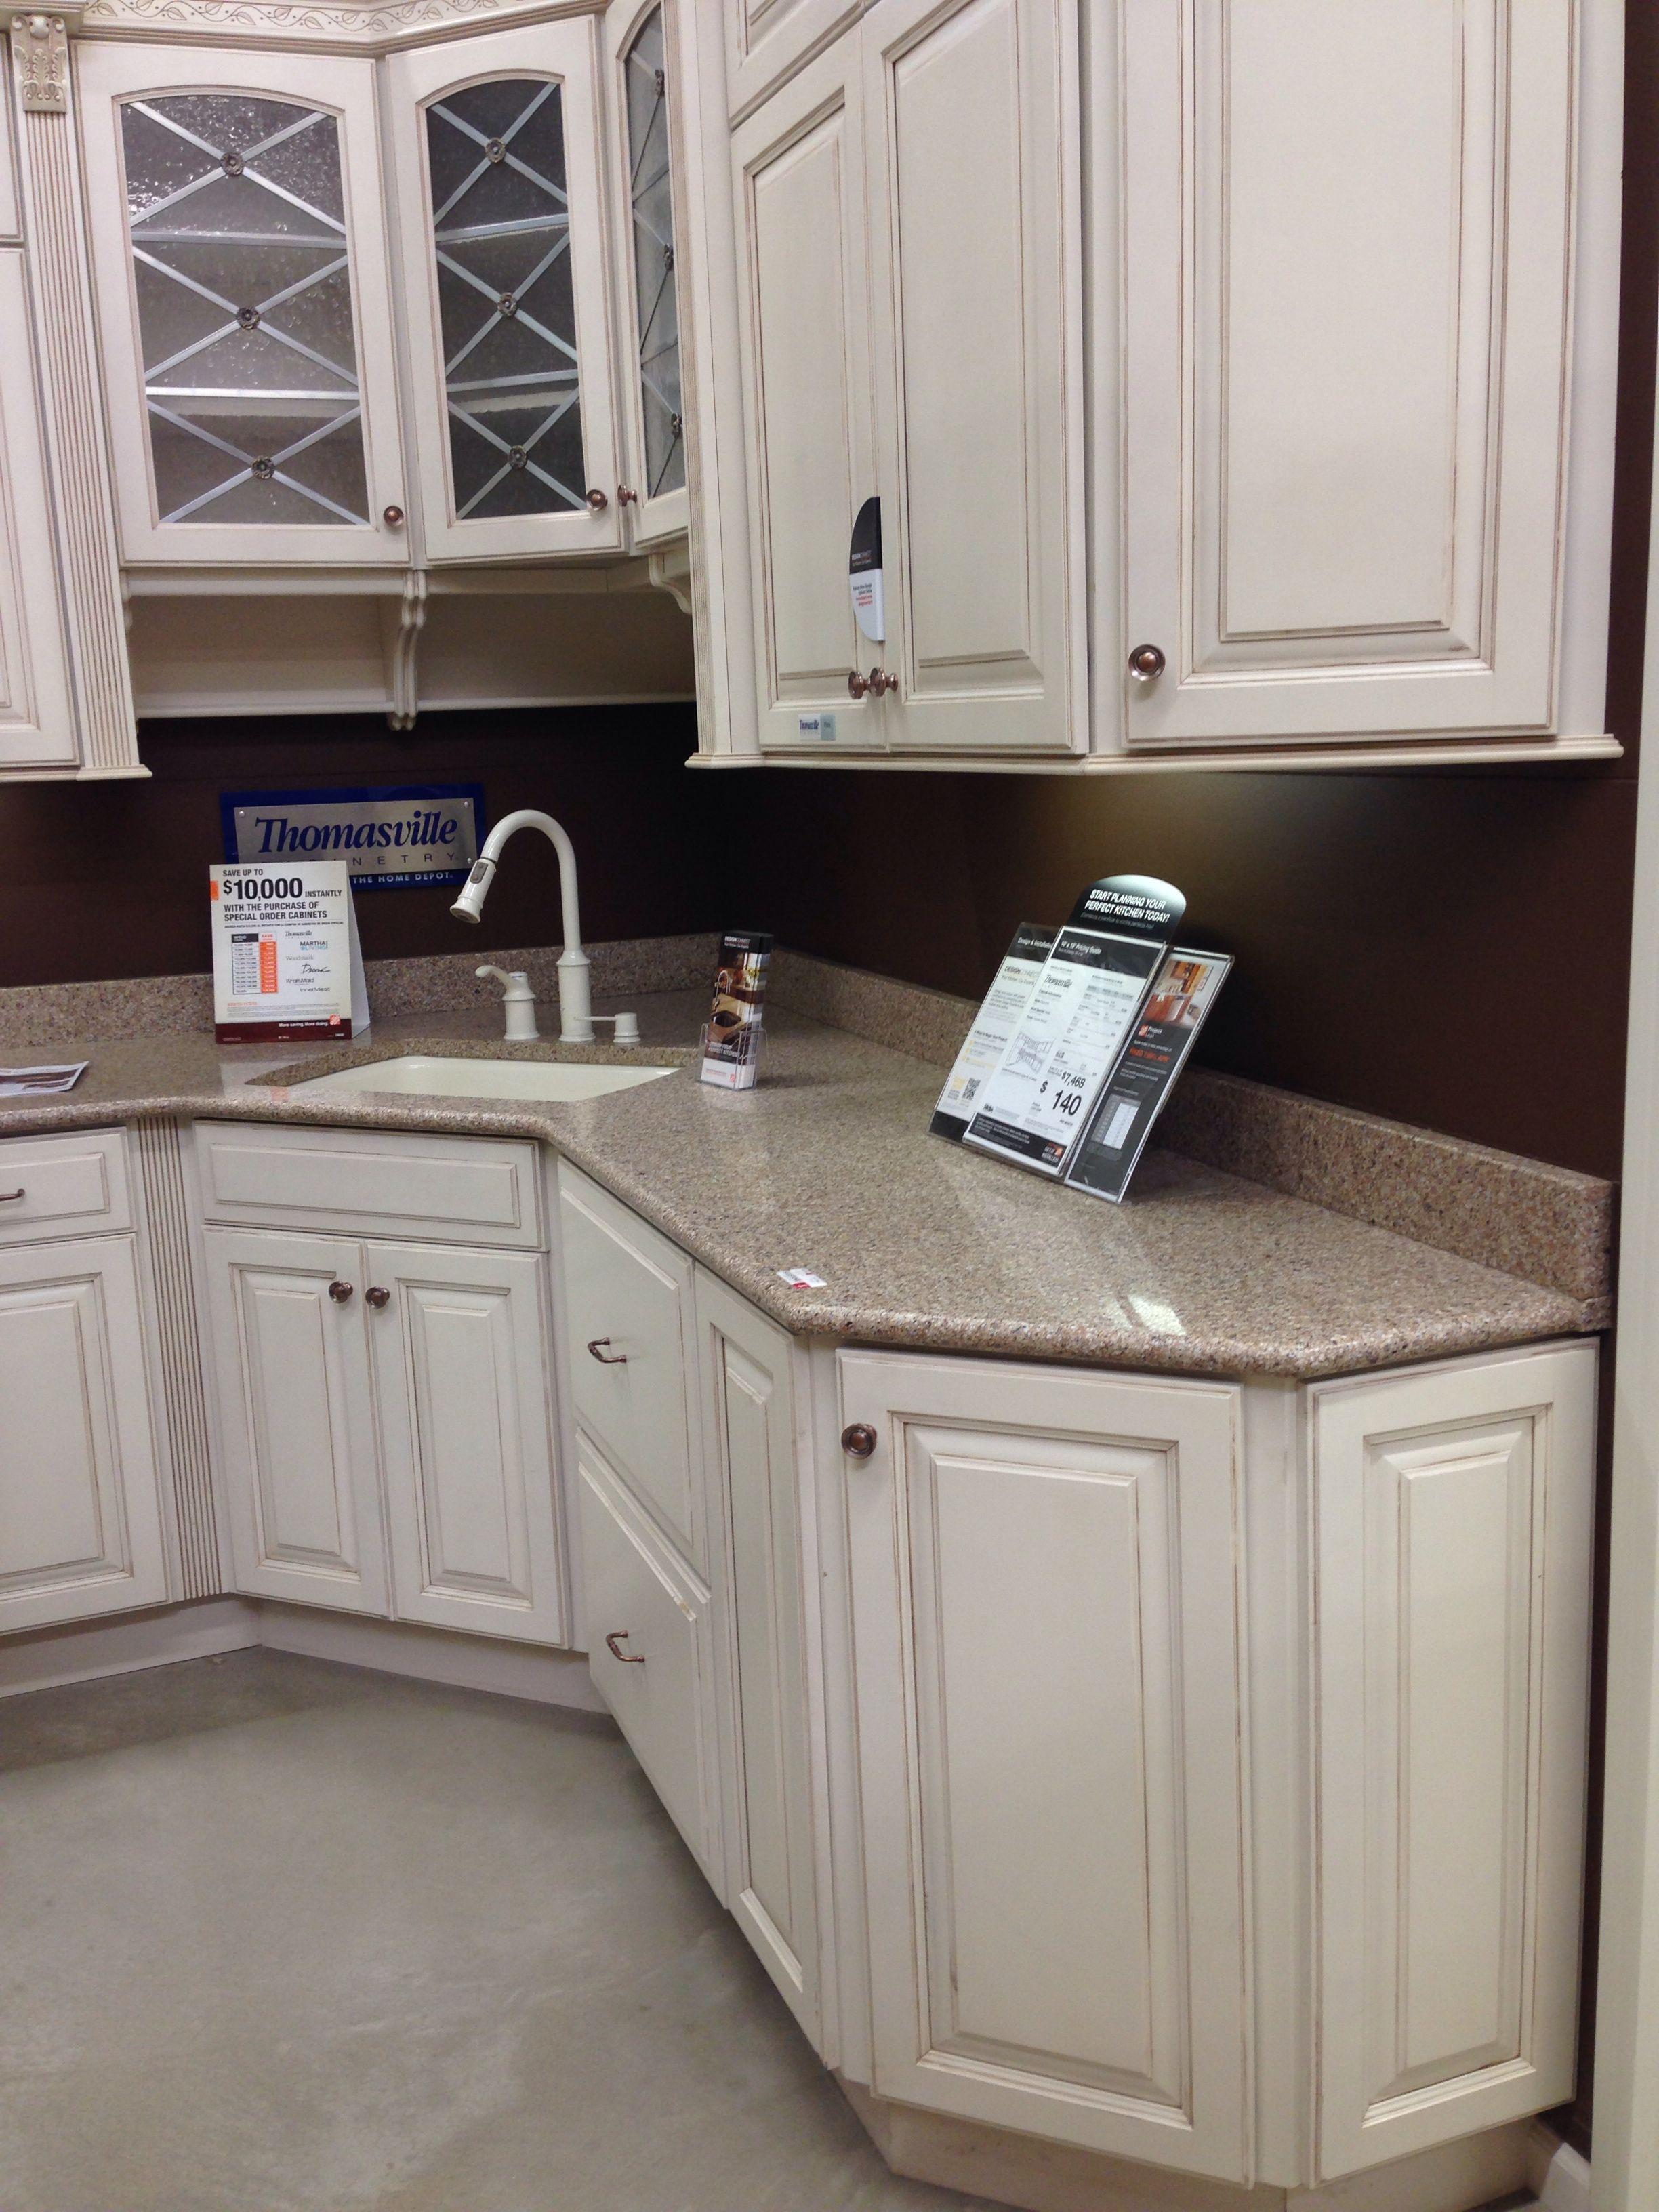 beige kitchen cabinets rustic sink plaza maple cabinet with kona silestone countertop